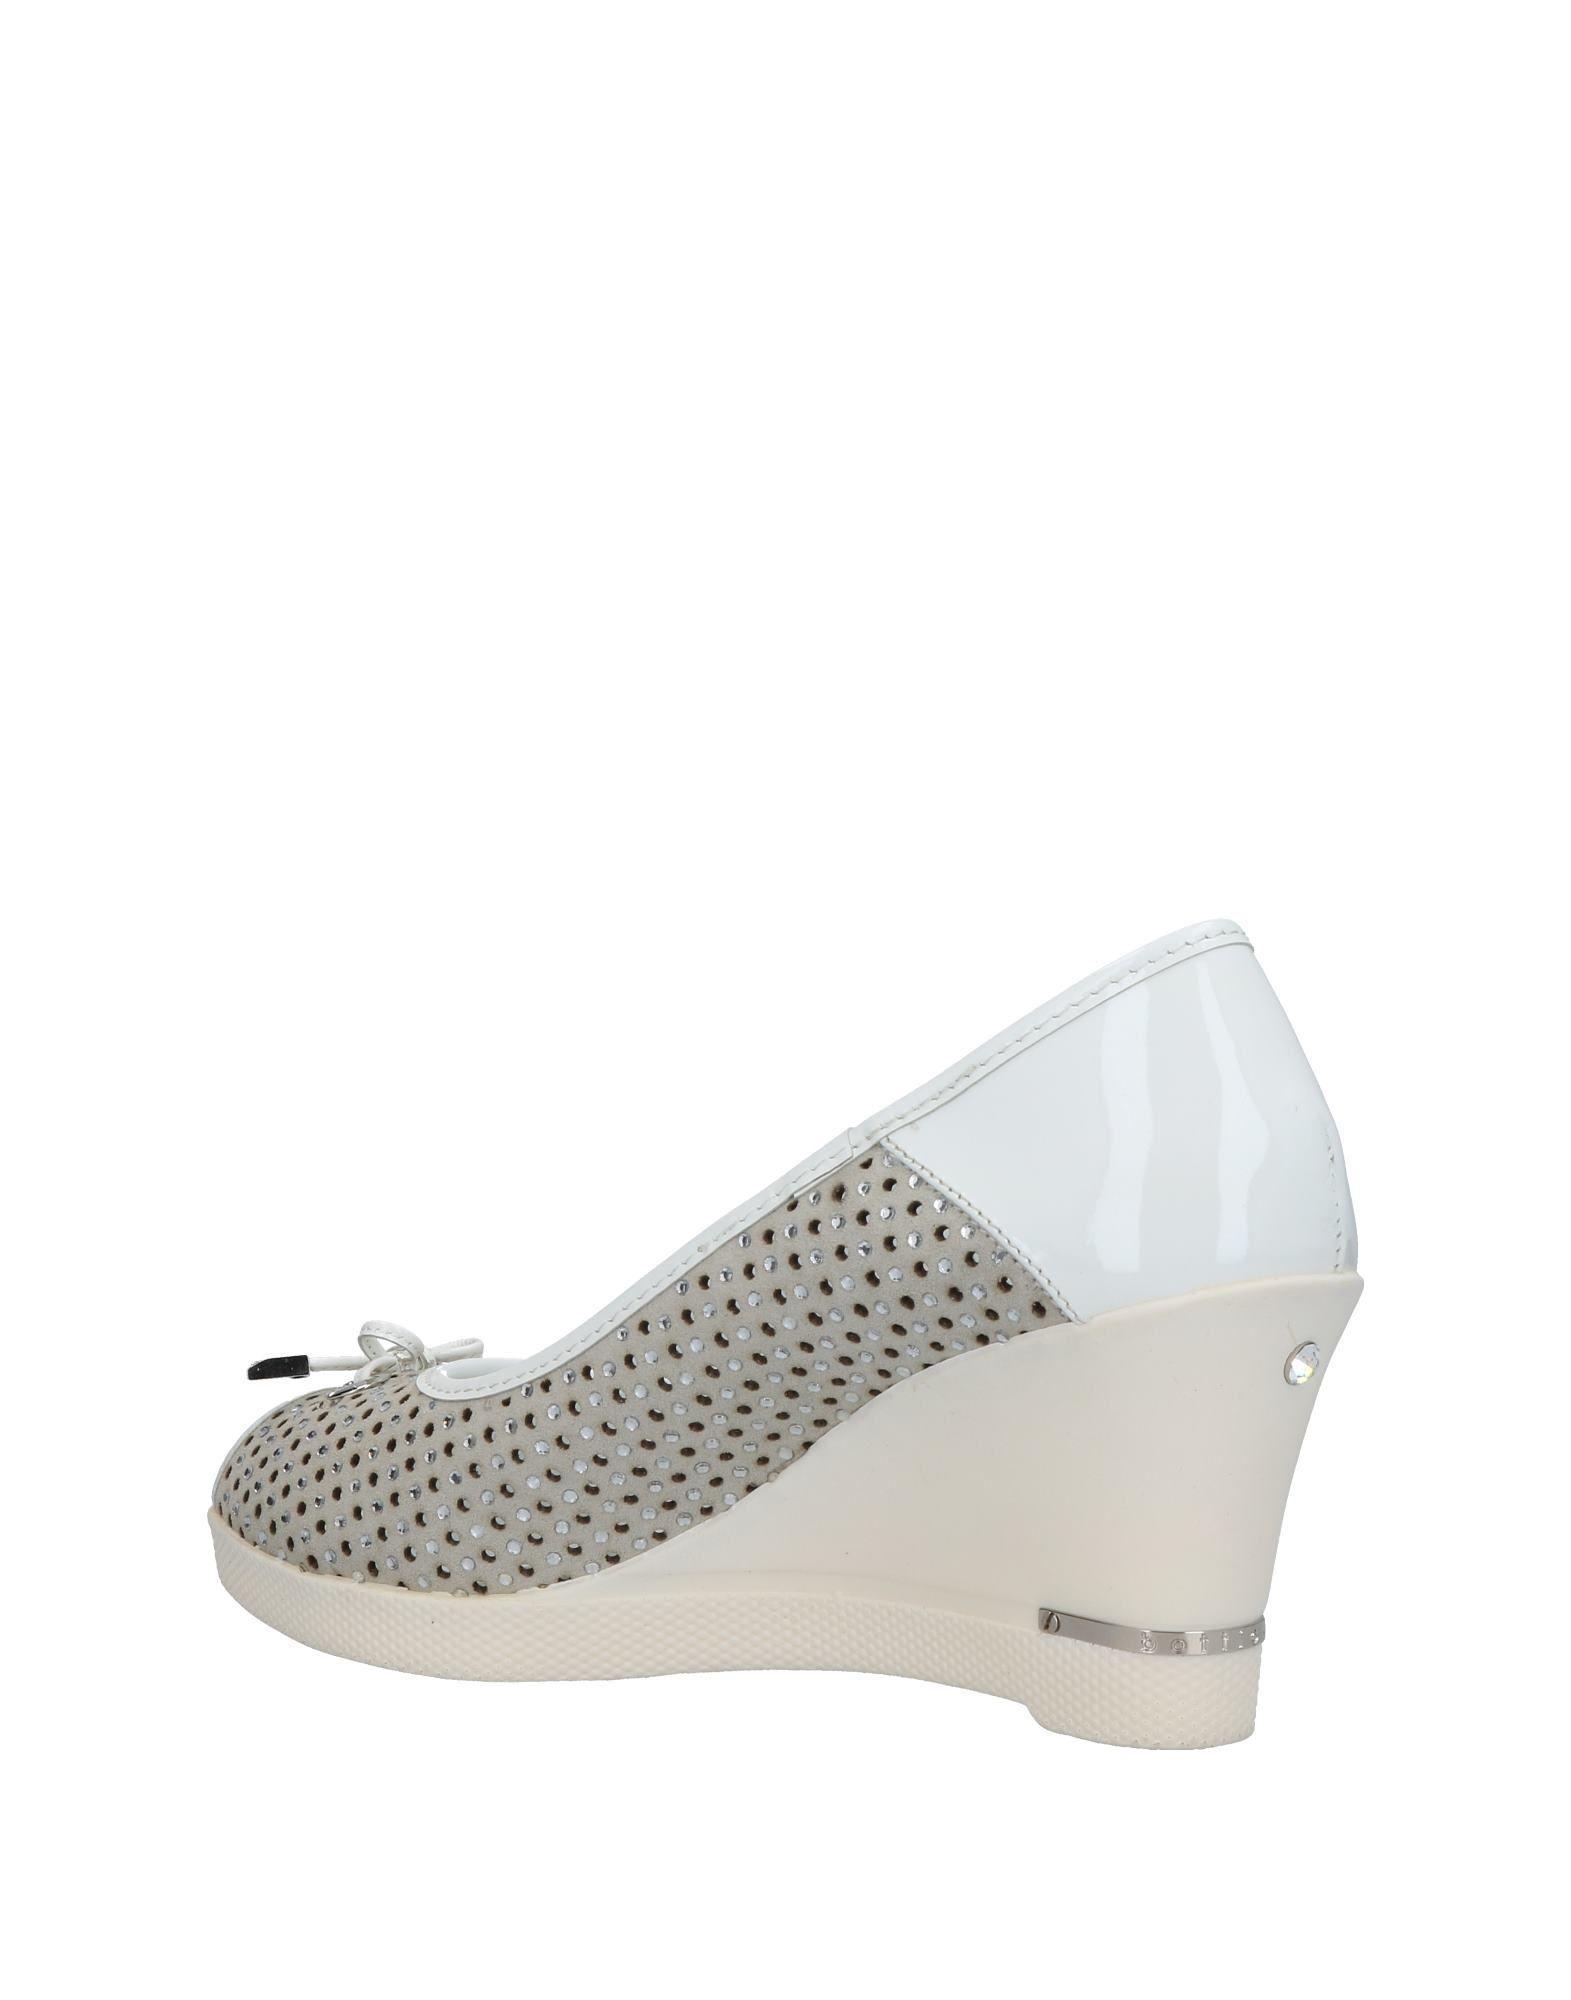 Chaussures - Tribunaux Botticelli Limitées YO5nrnu2